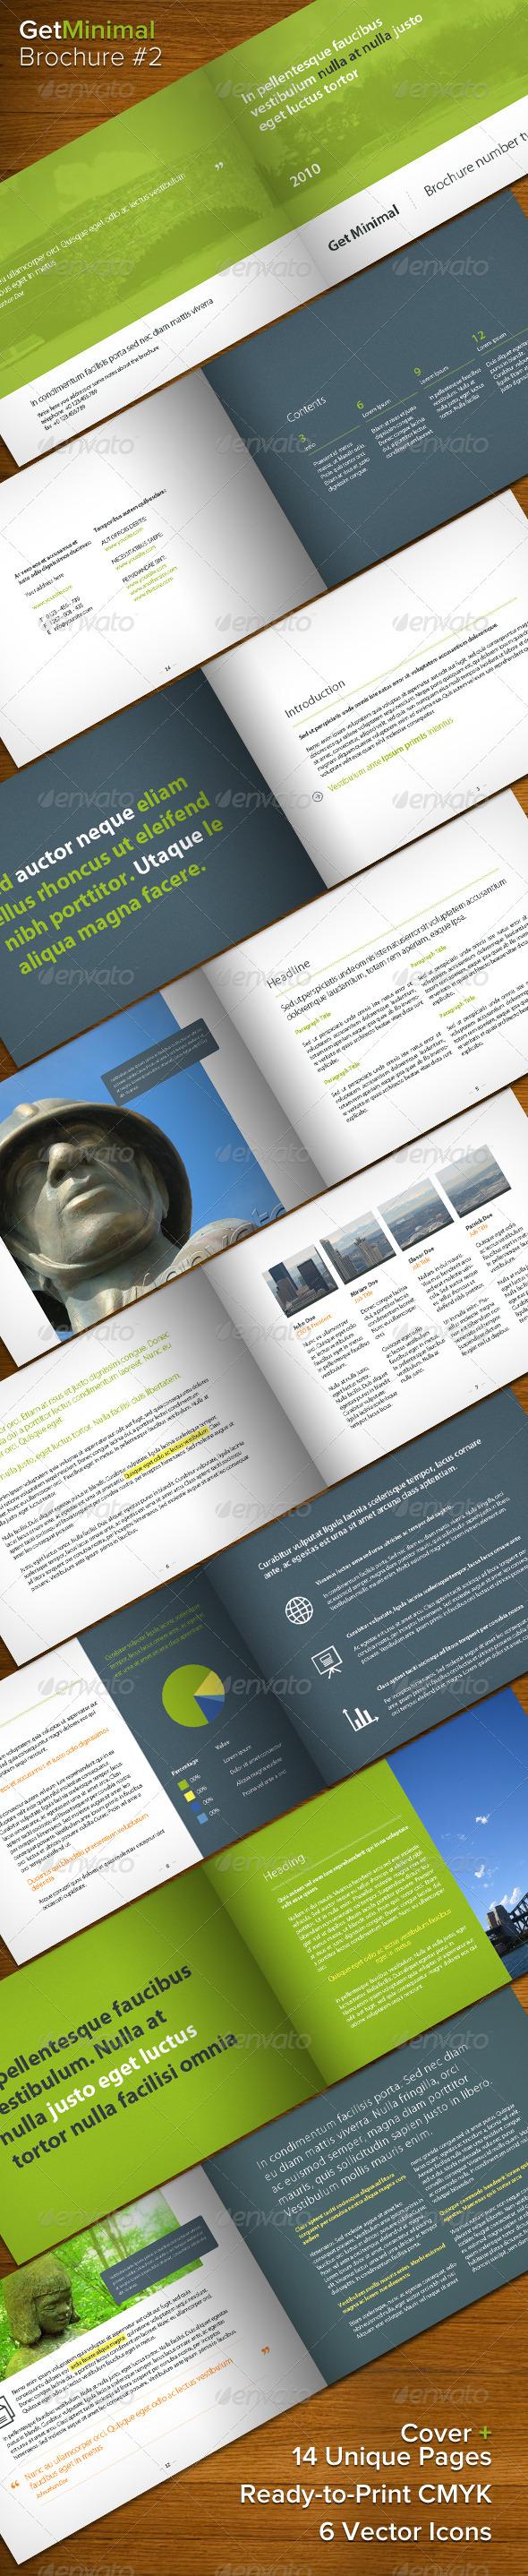 GraphicRiver Get Minimal Brochure 02 411886